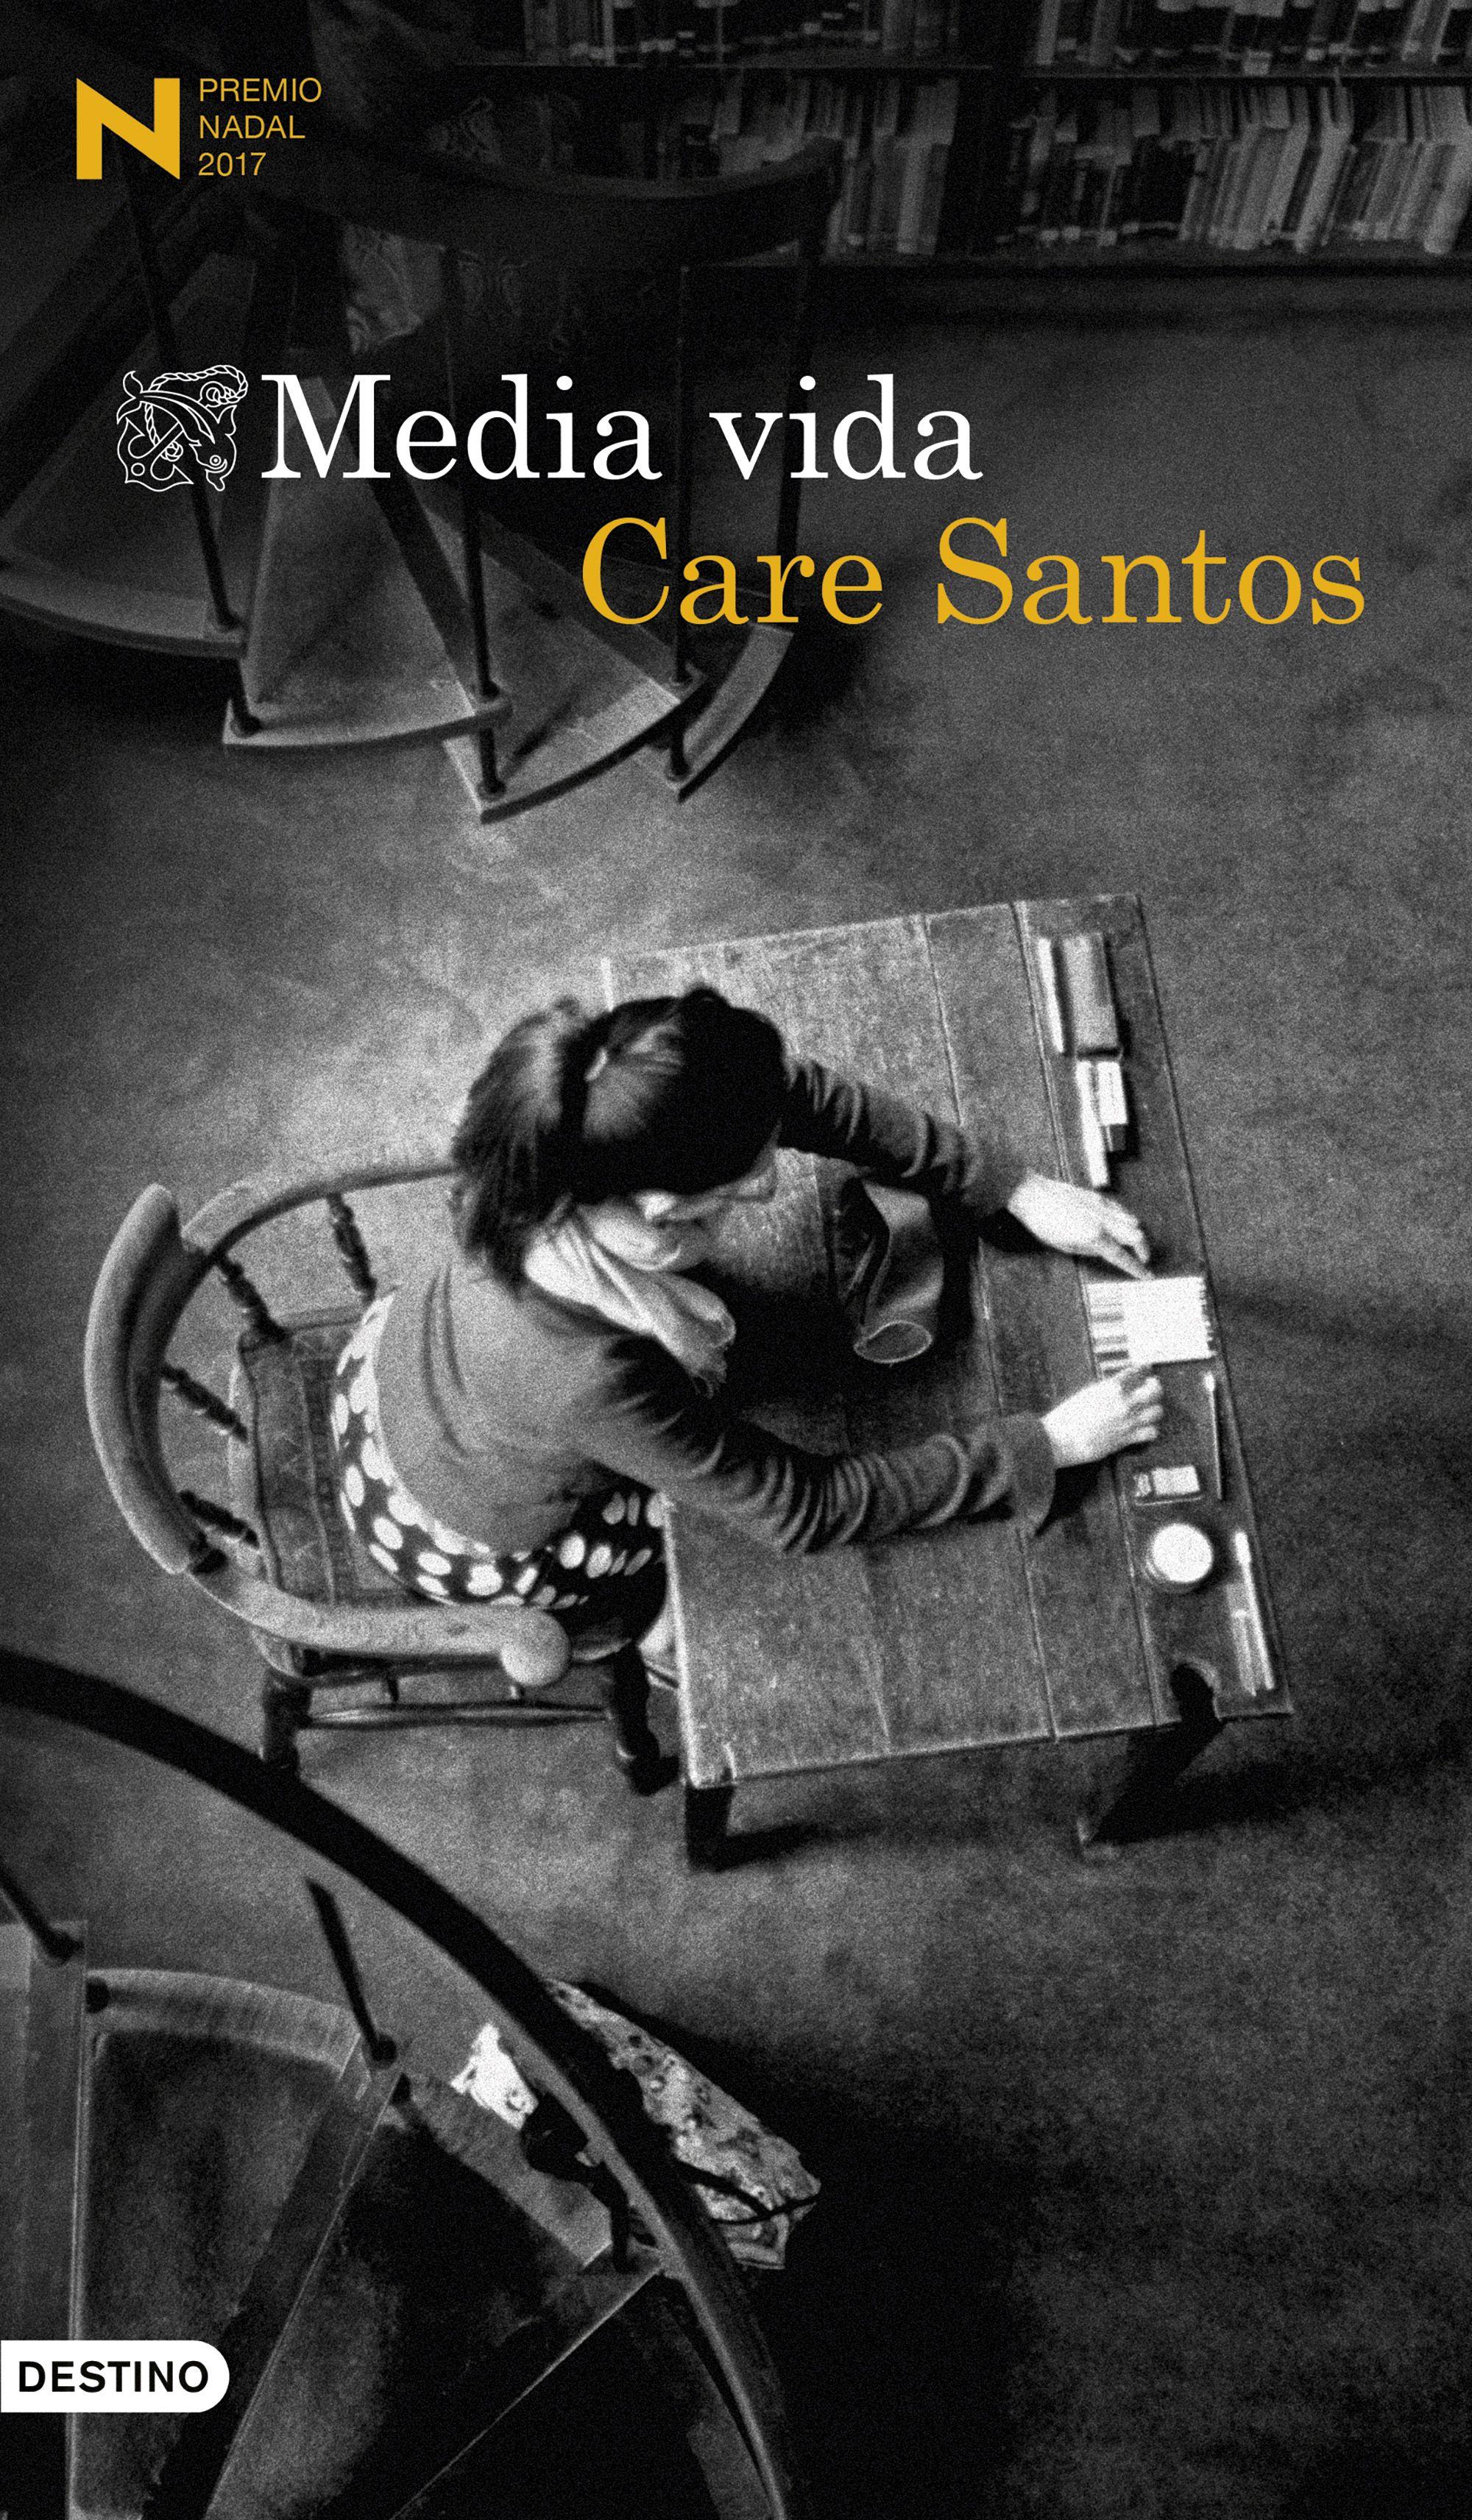 media-vida-care-santos-premio-nadal-2017-portada